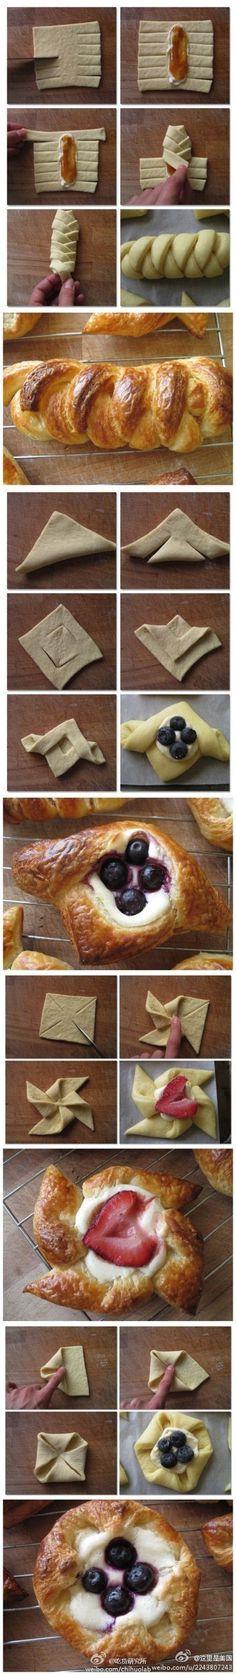 Pastry folding 101